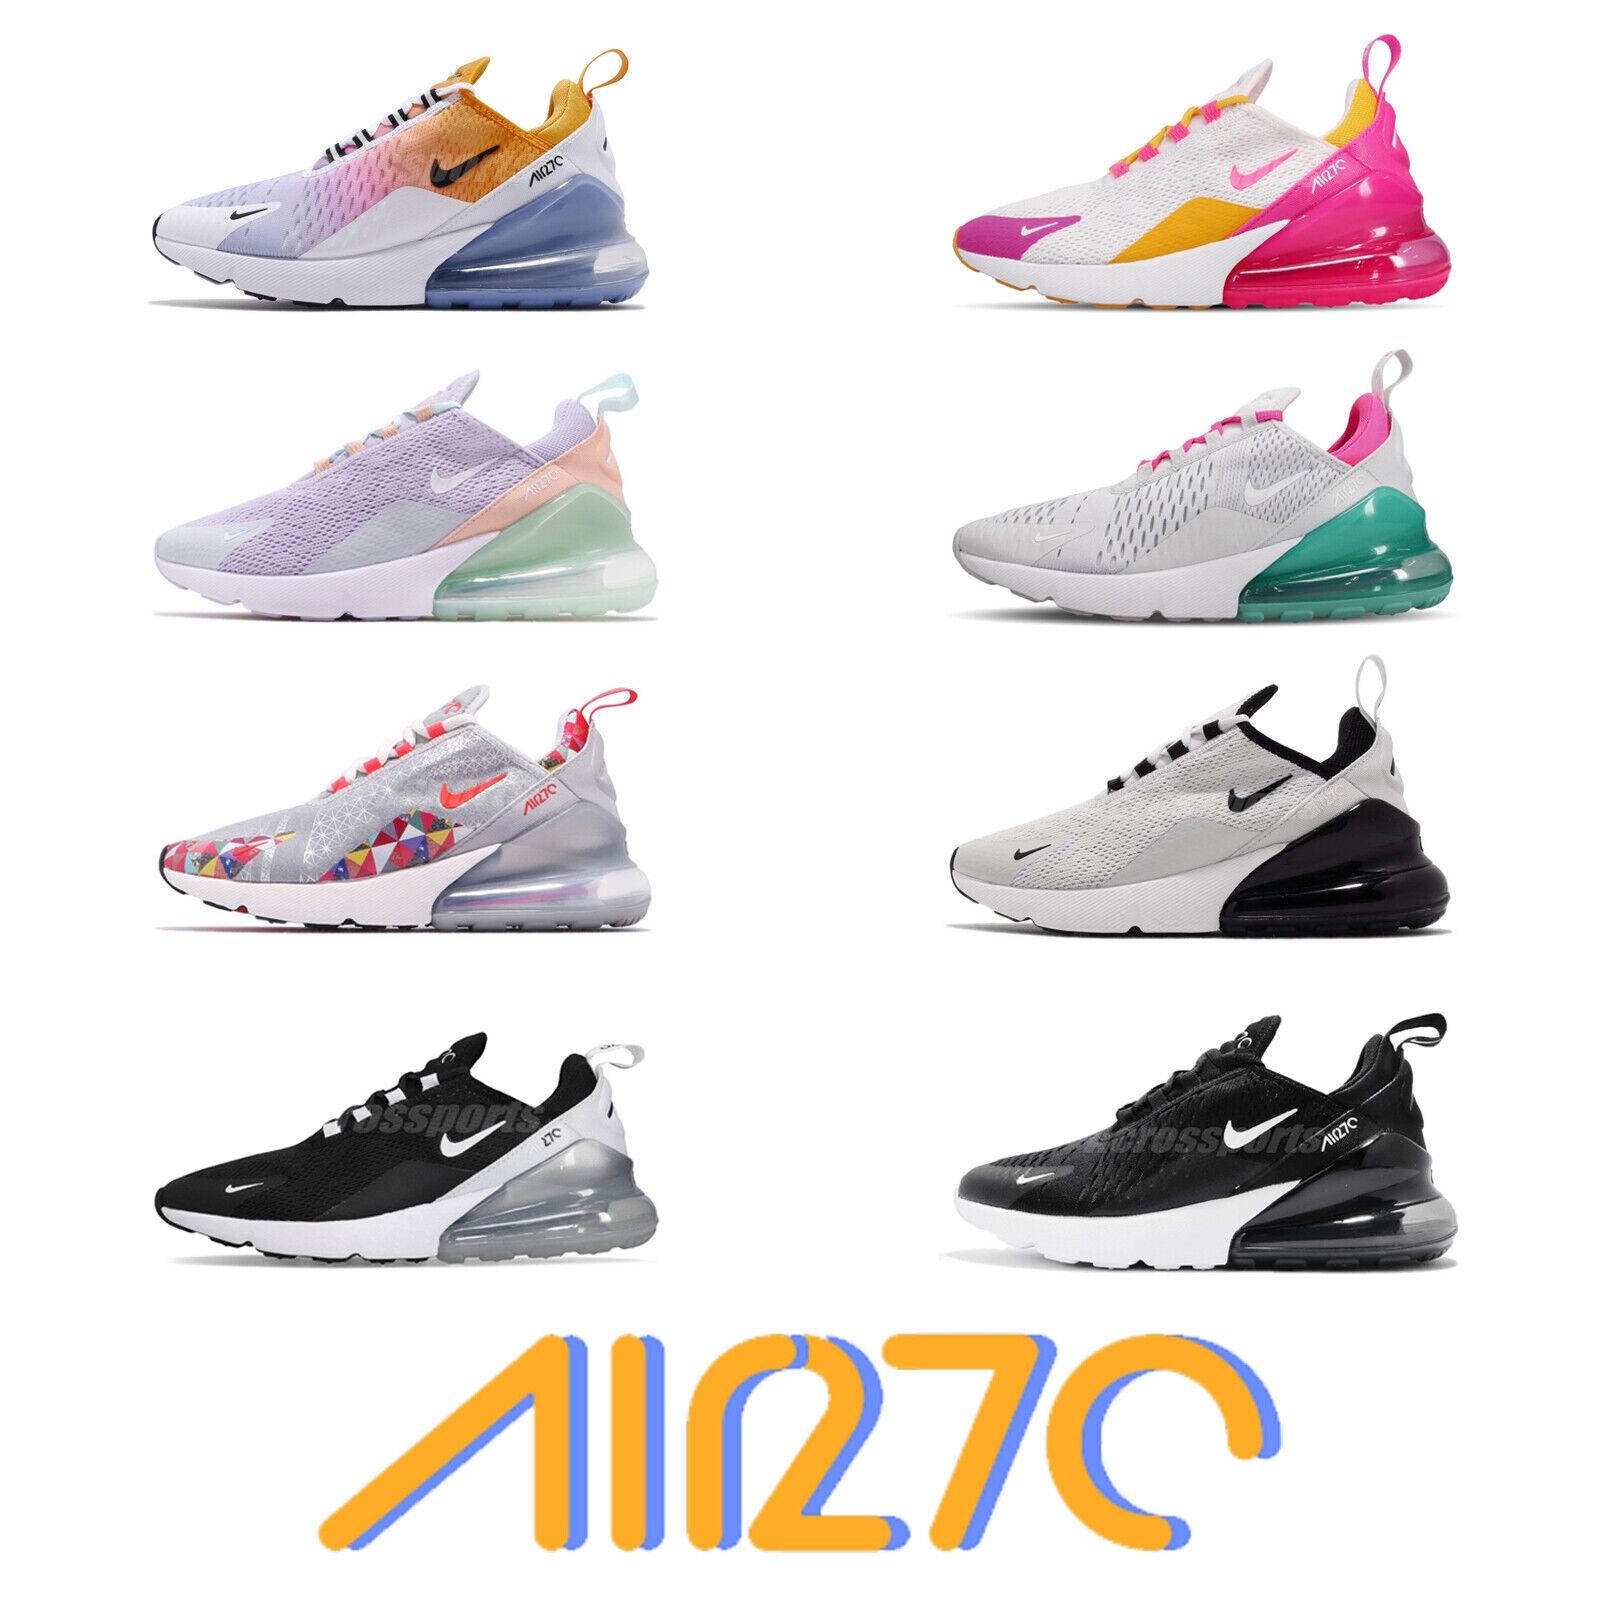 Nike Wmns Air Max 270 Women Running